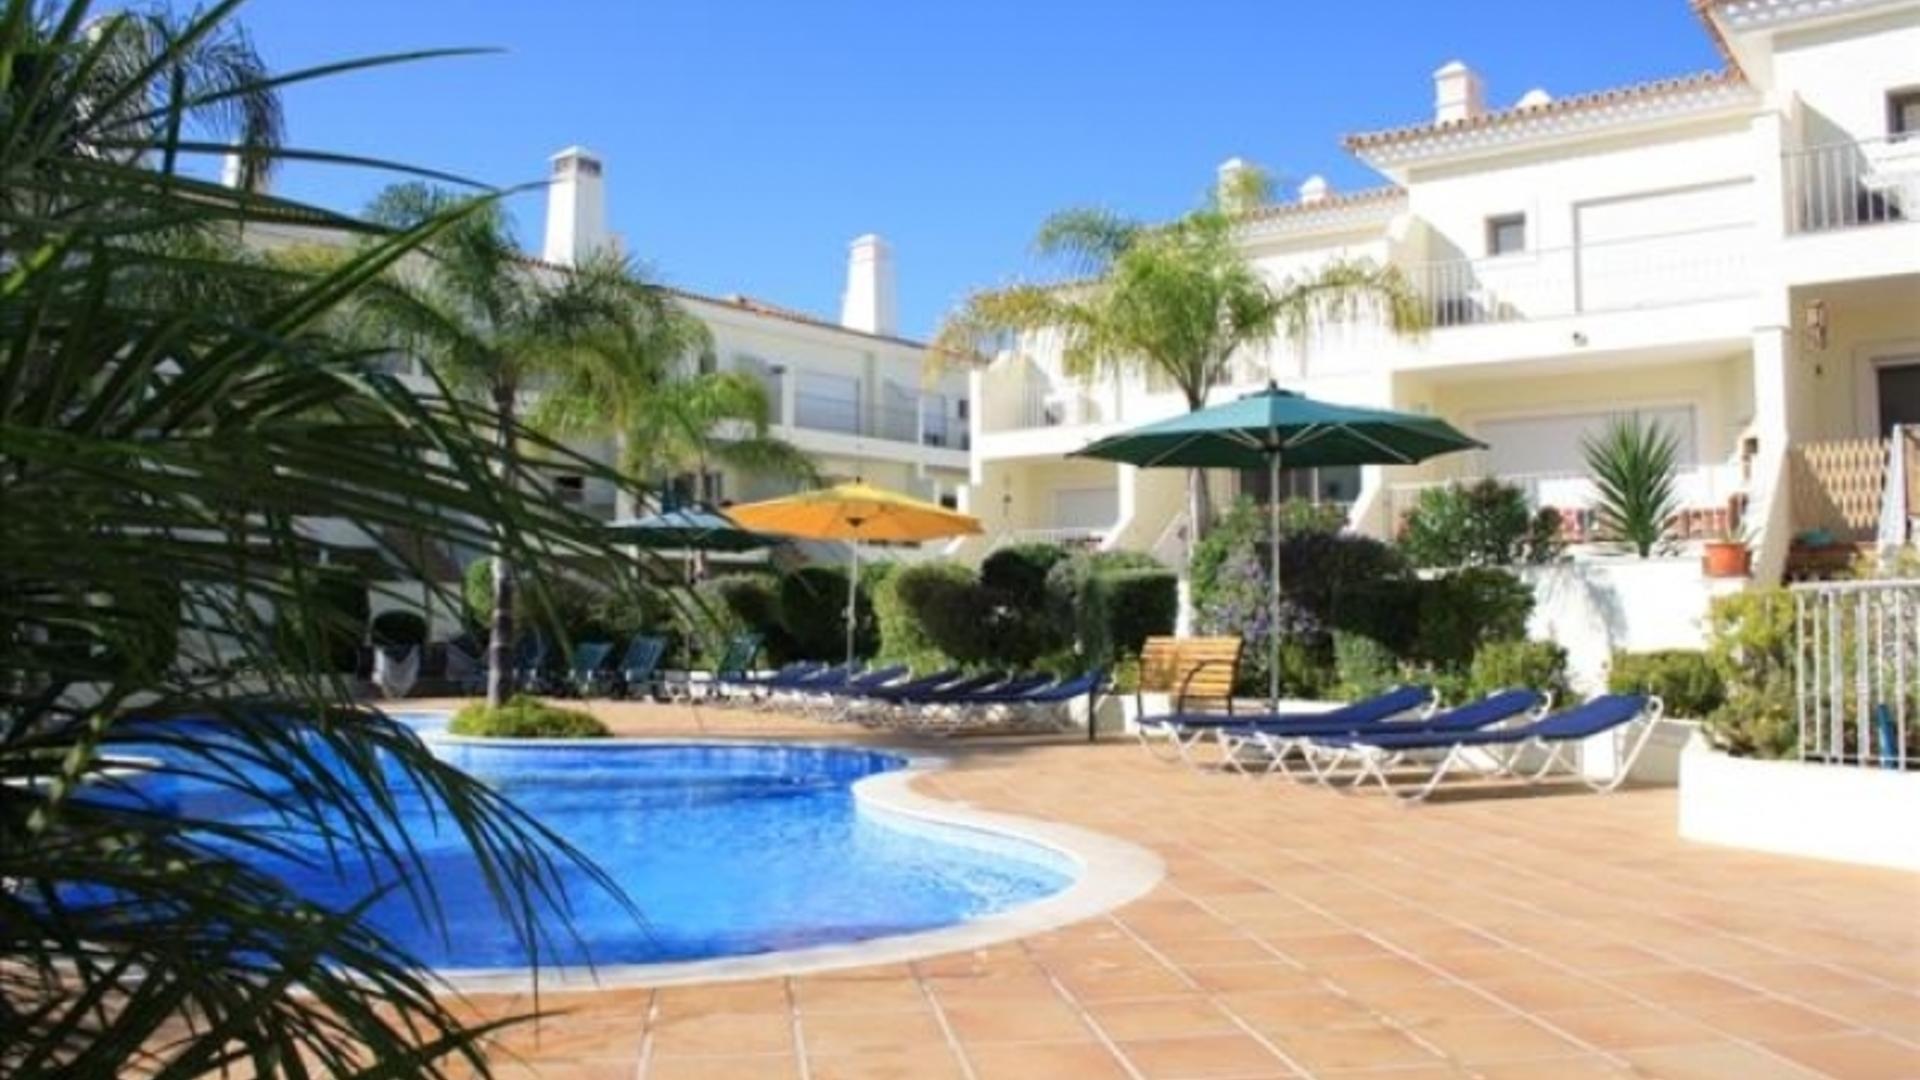 4 Bedroom Villa in  Portugal